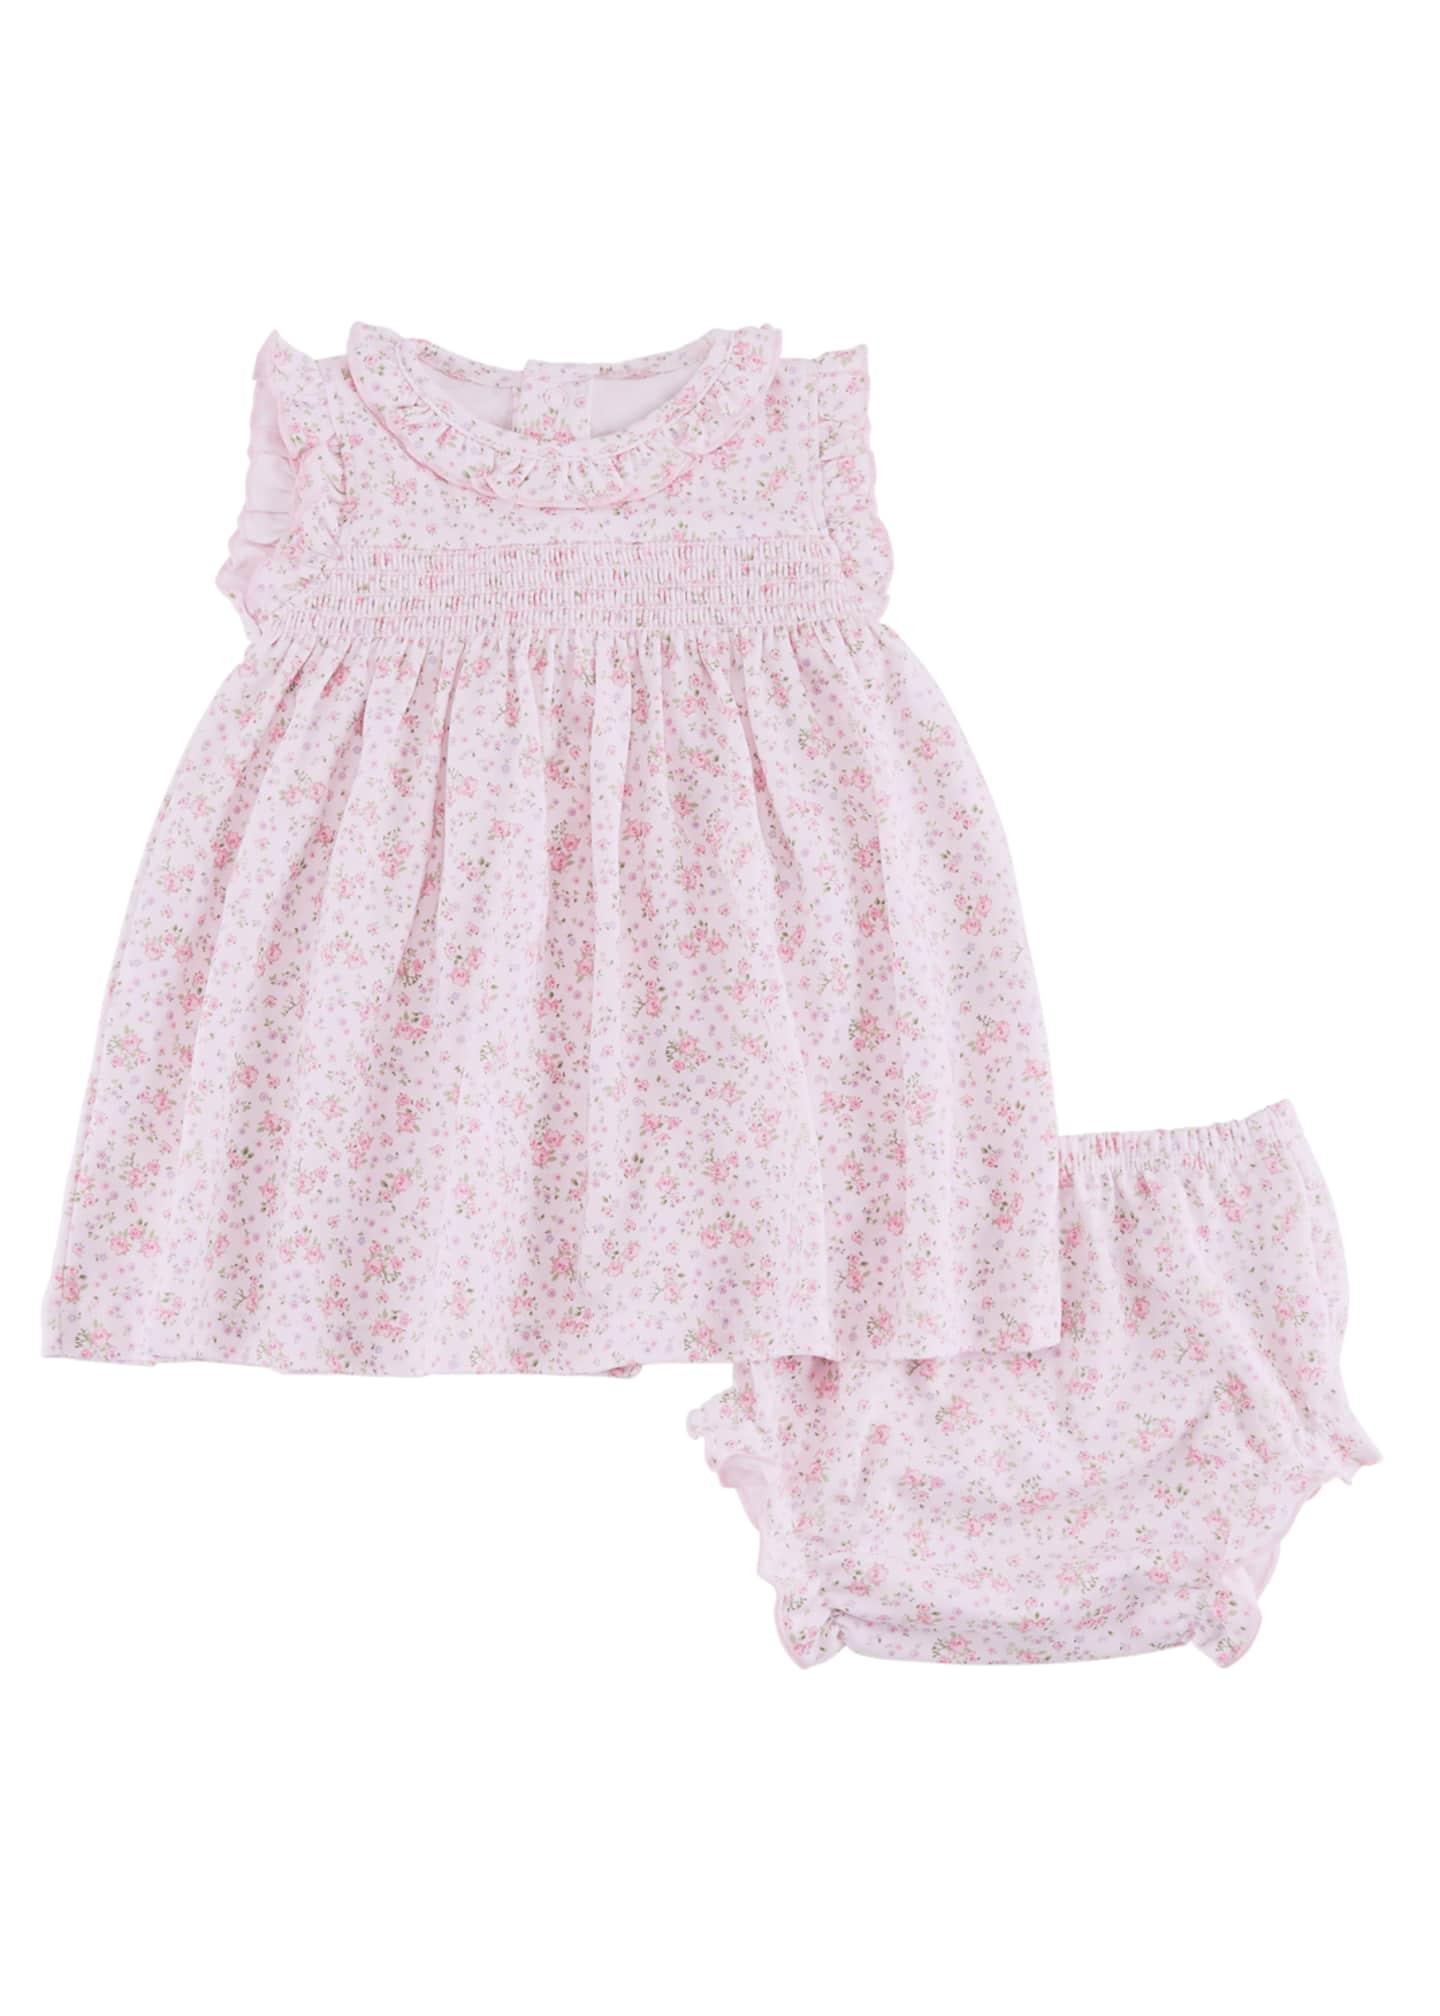 Kissy Kissy Dusty Rose Pima Dress w/ Matching